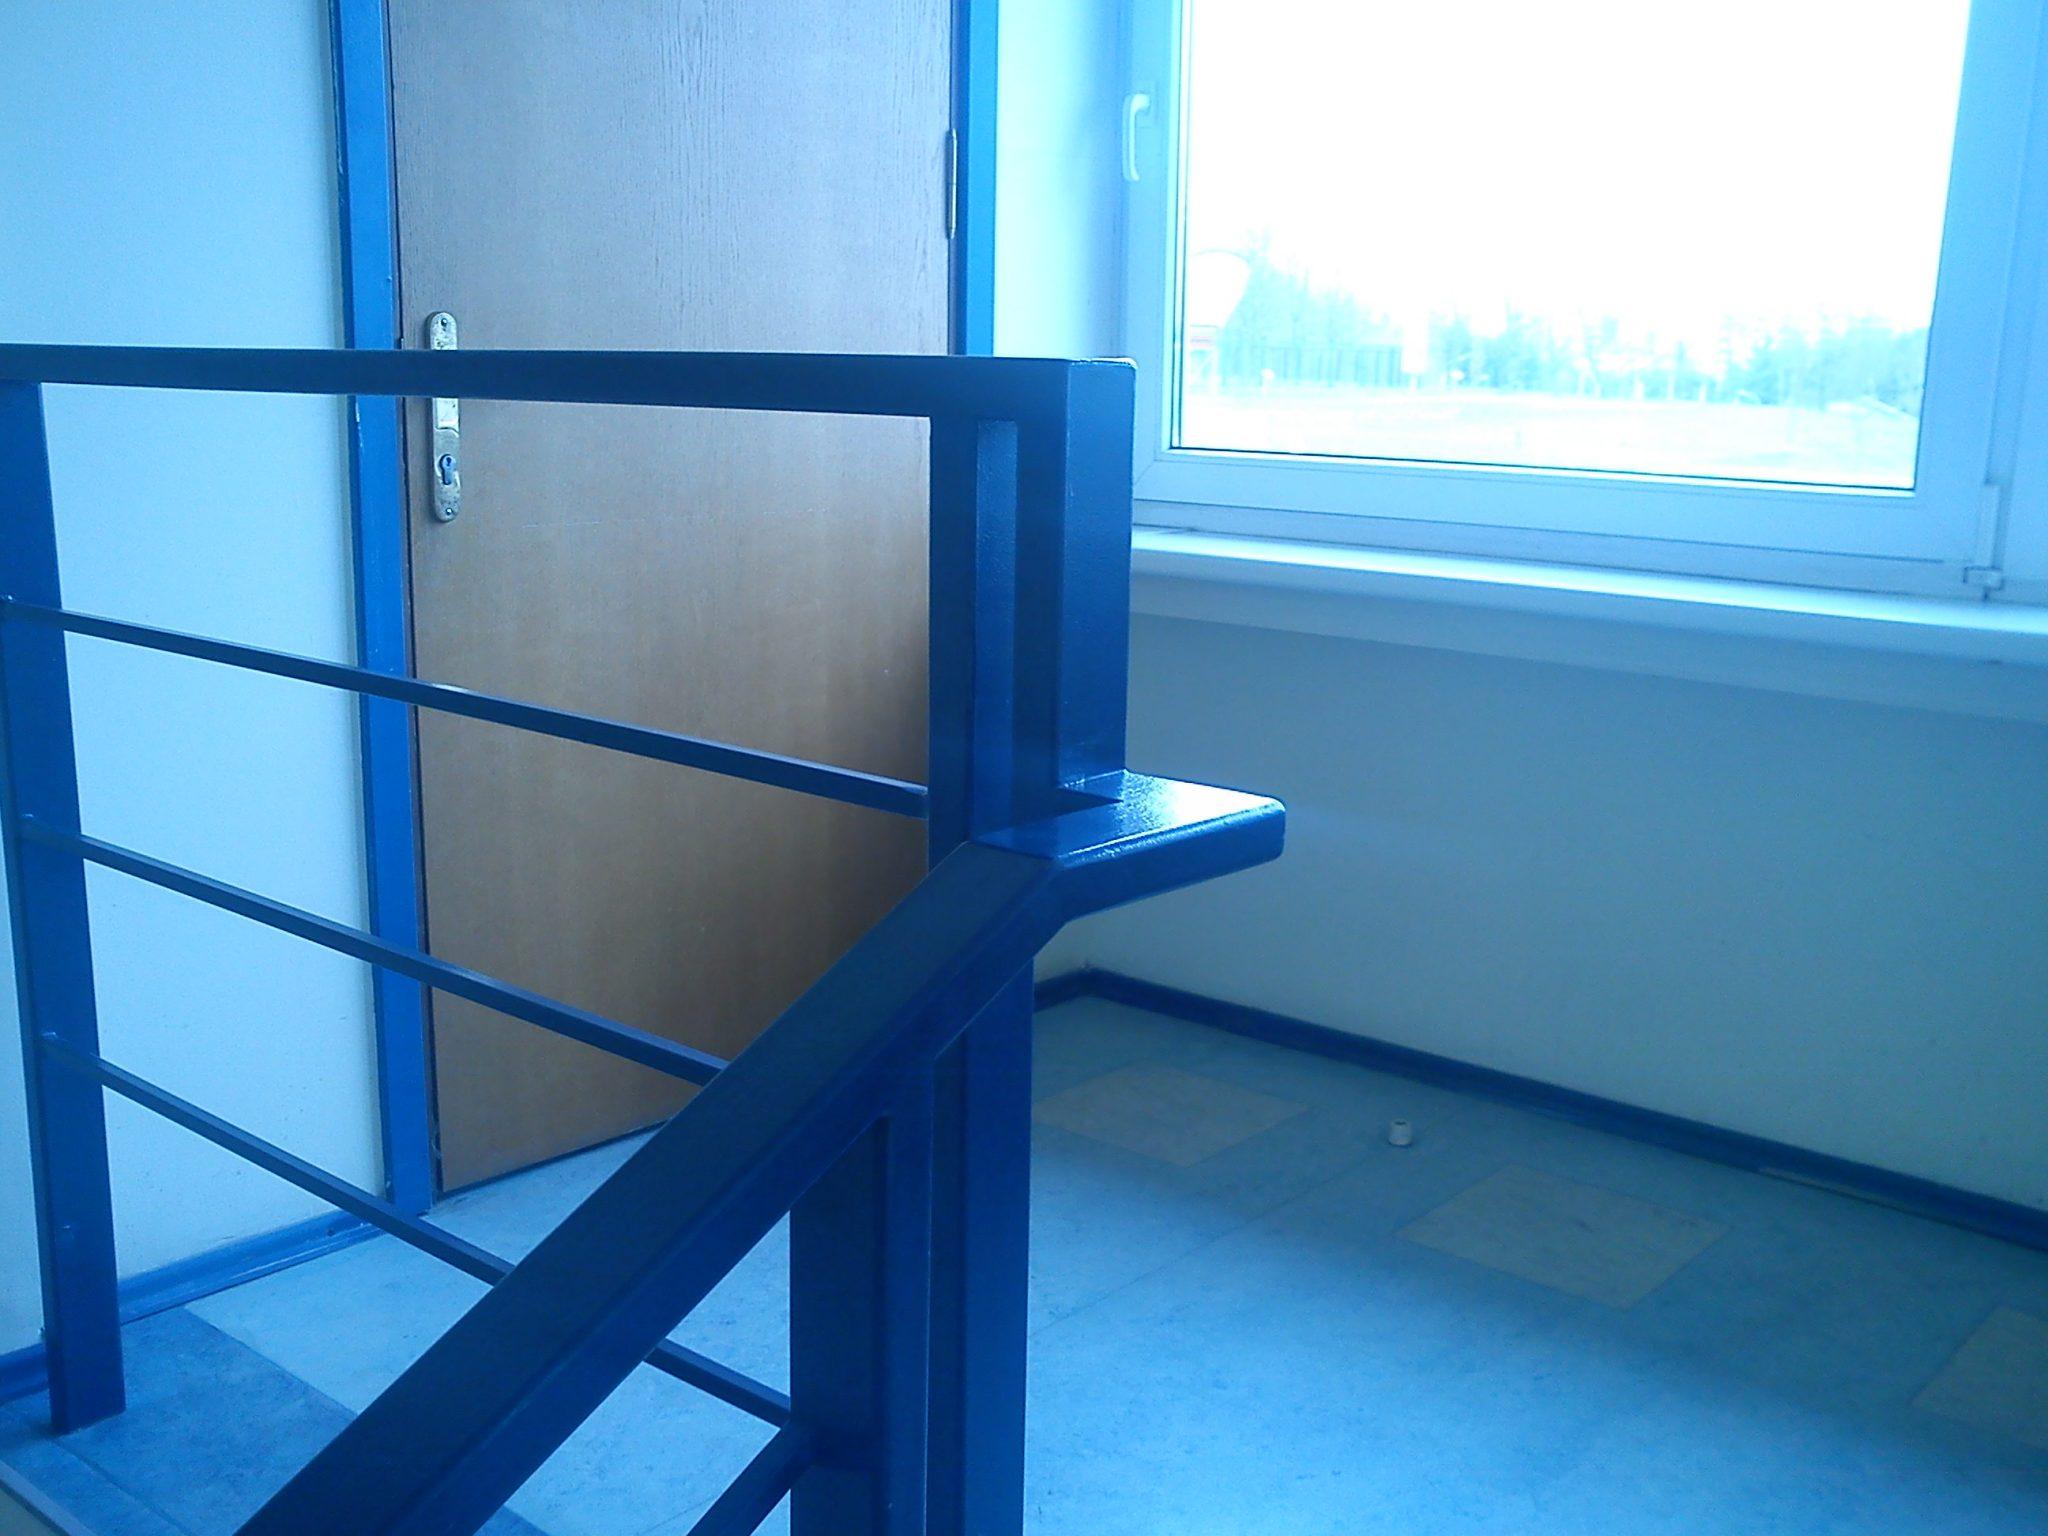 mild steel balustrades stainless steel fabrications in. Black Bedroom Furniture Sets. Home Design Ideas